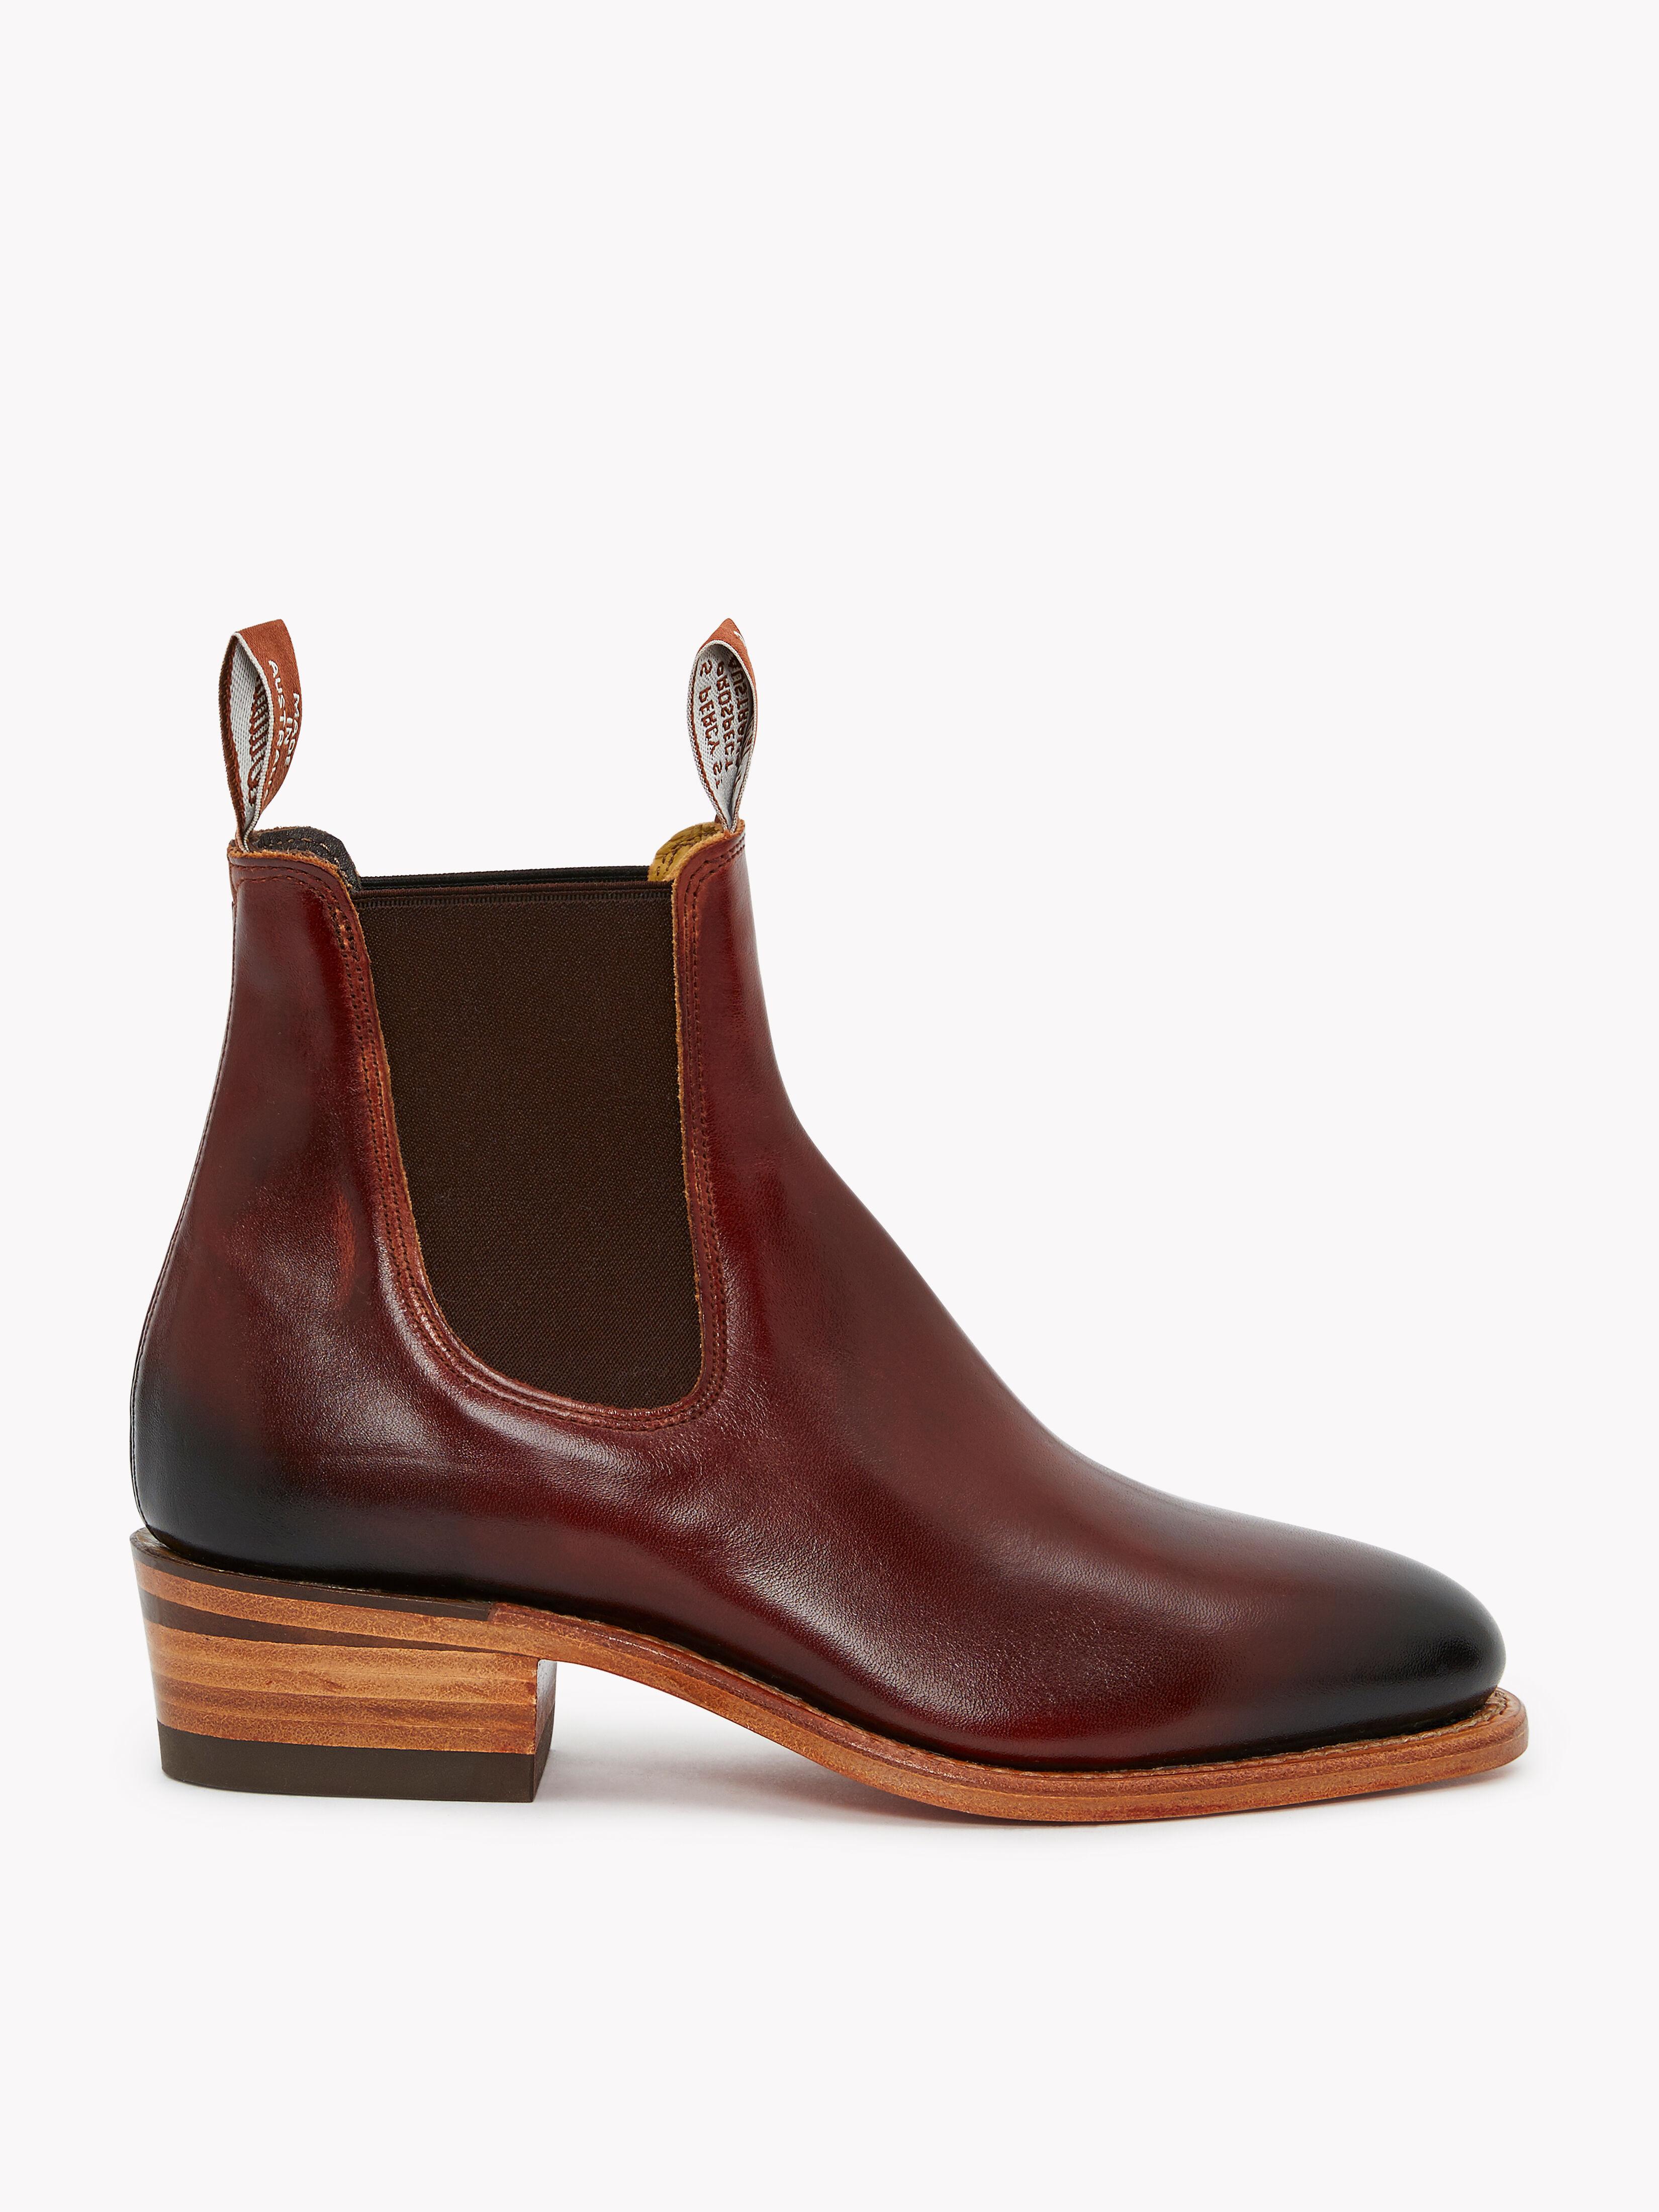 Women's Boots, Boots for Women  